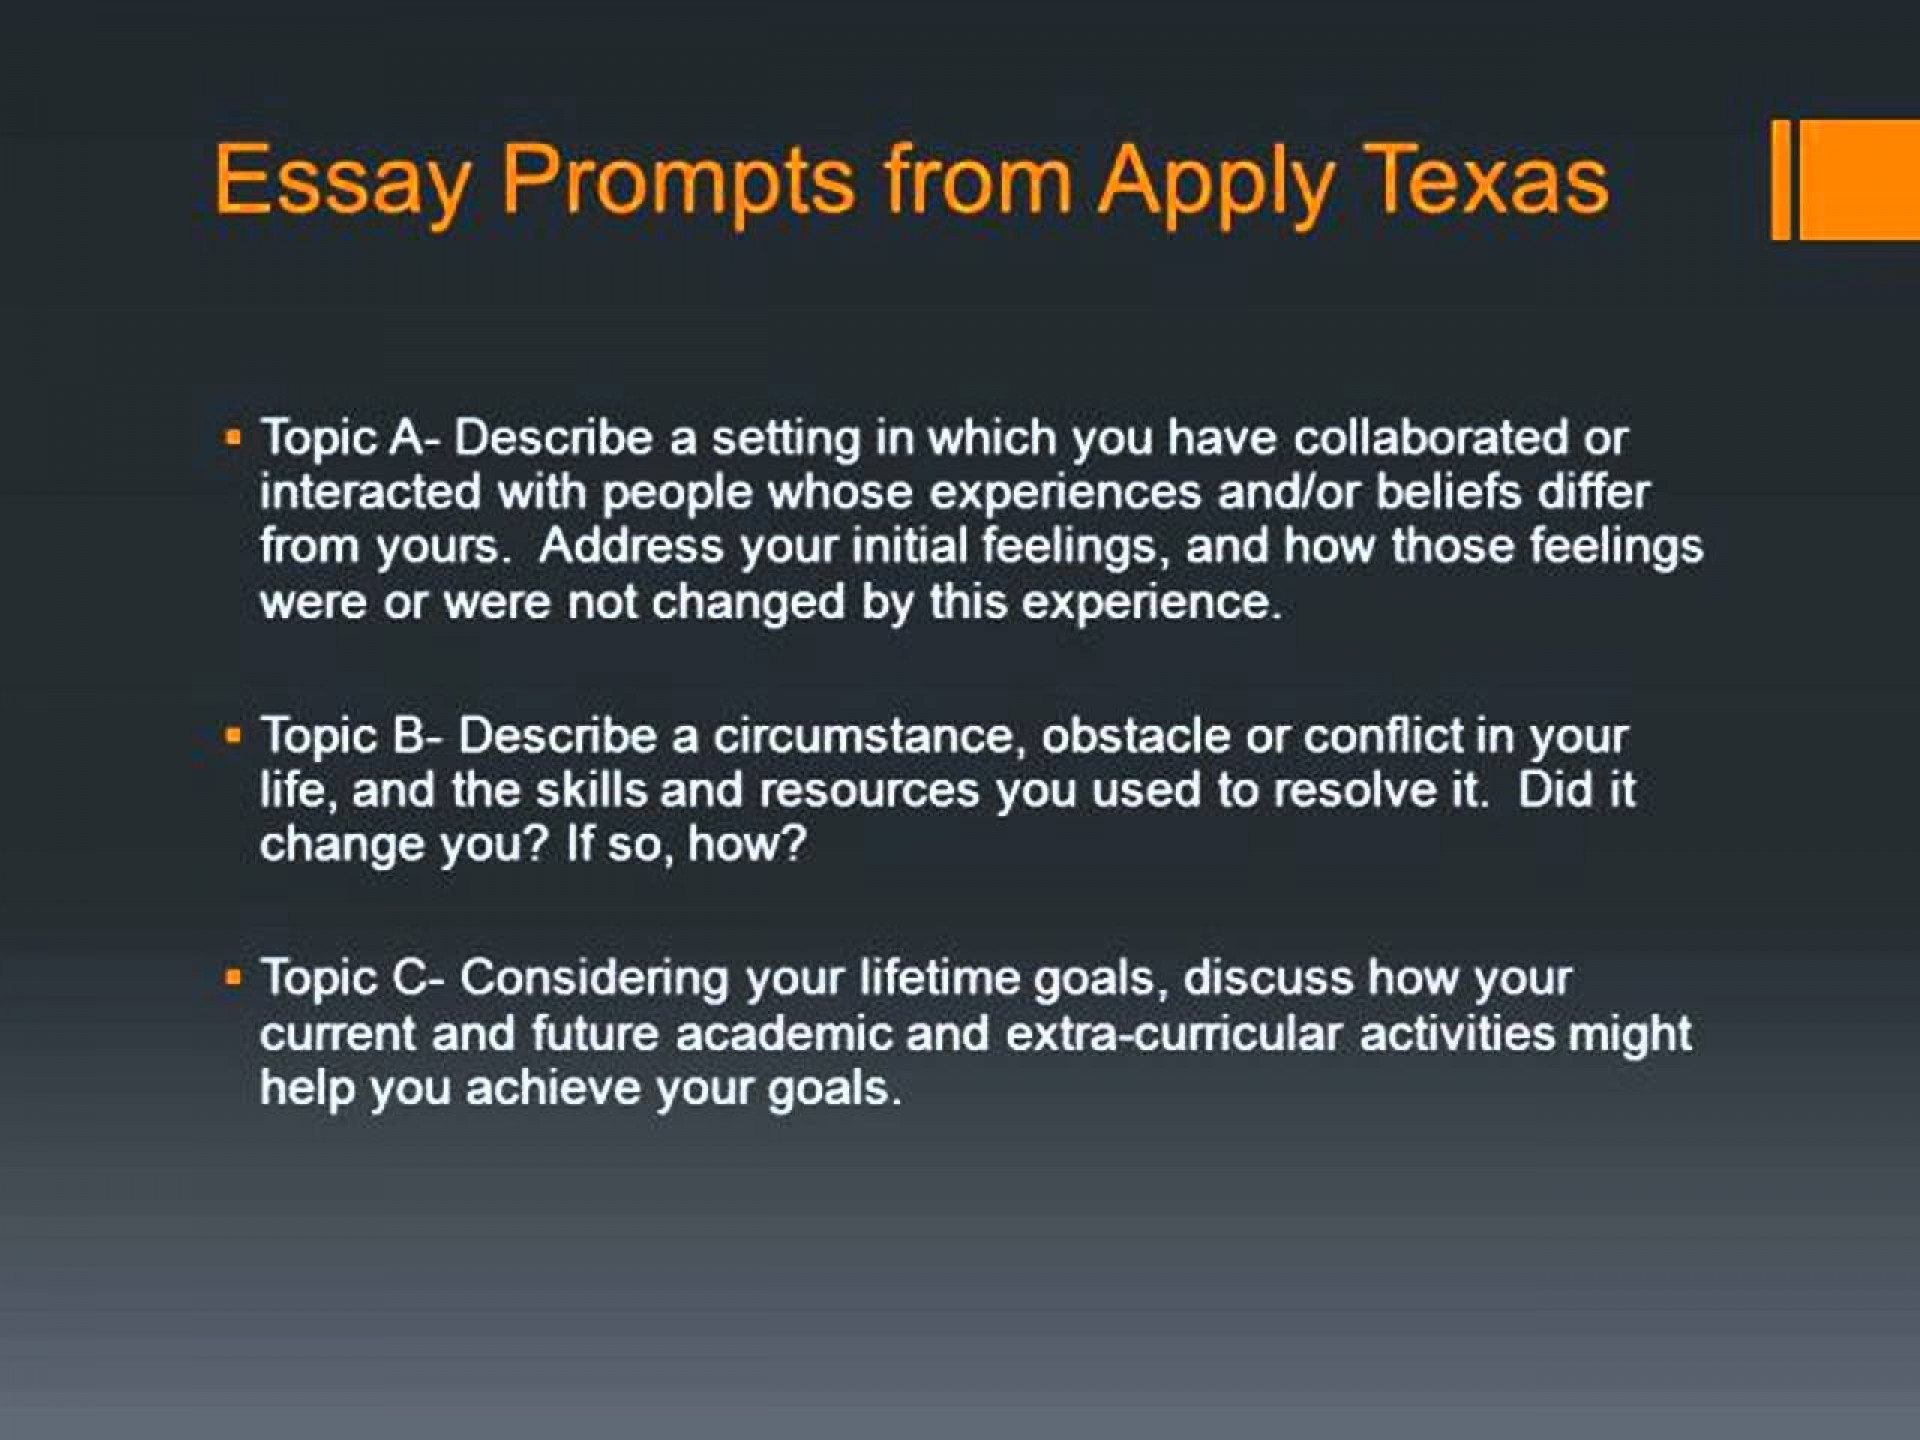 014 Apply Texas Essay Topics For Falls Essays Applytexas Word Limit Topic Impressive Fall 2015 1920